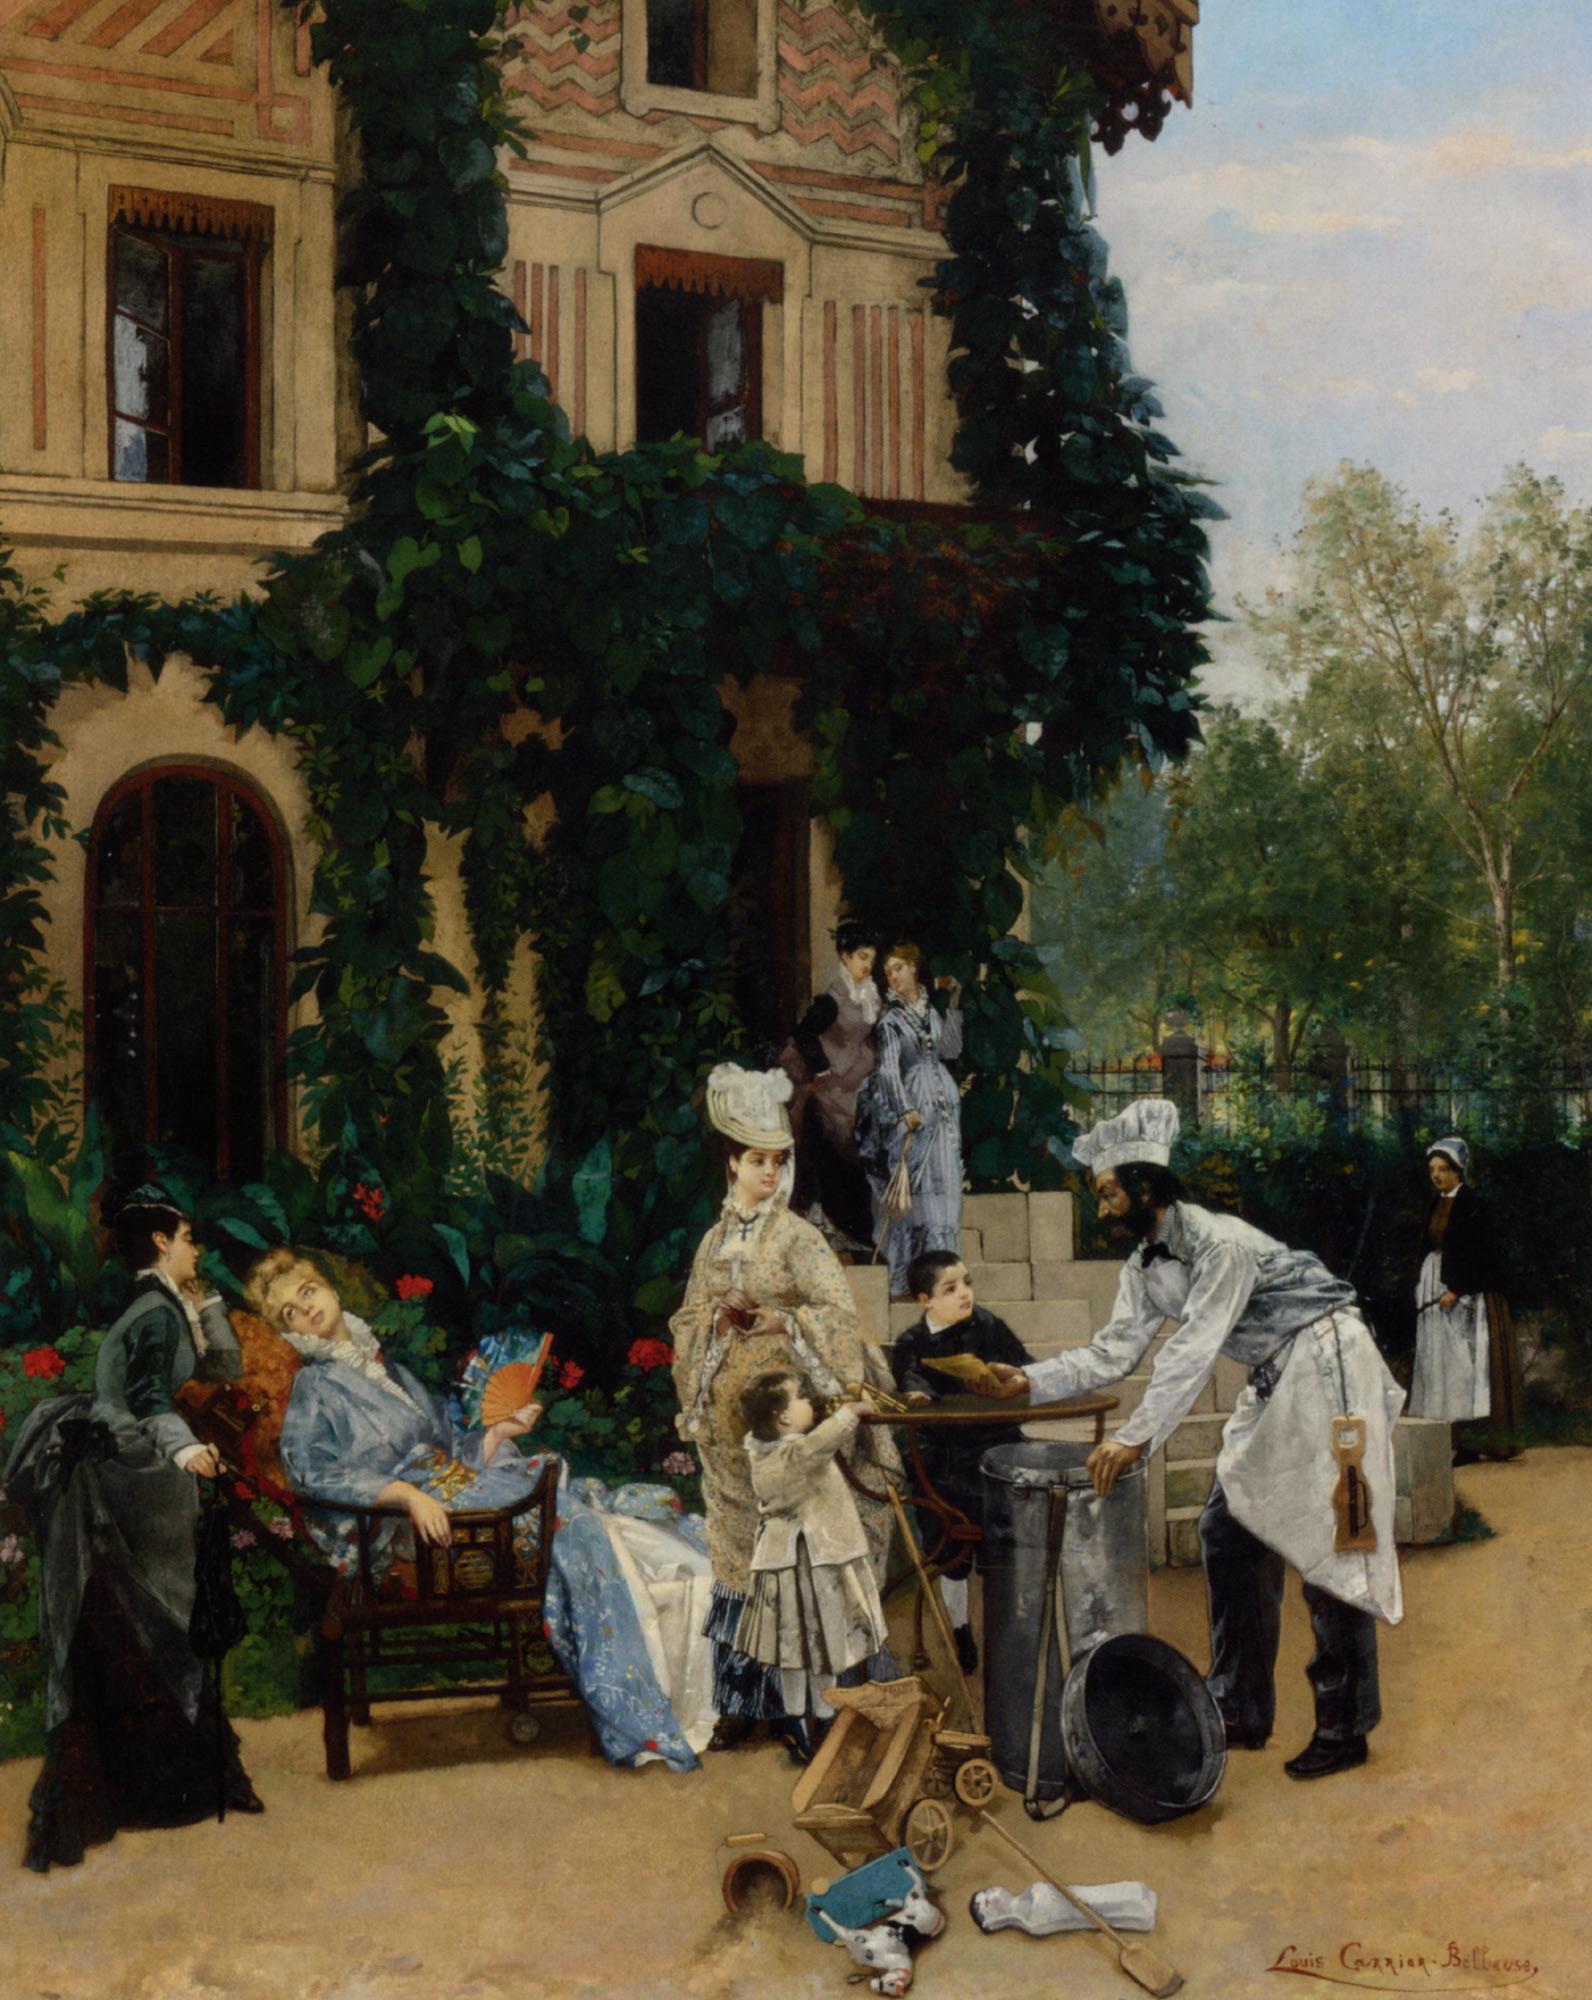 Crepe Maker :: Louis Robert Carrier-Belleuse - Street and market genre scenes ôîòî